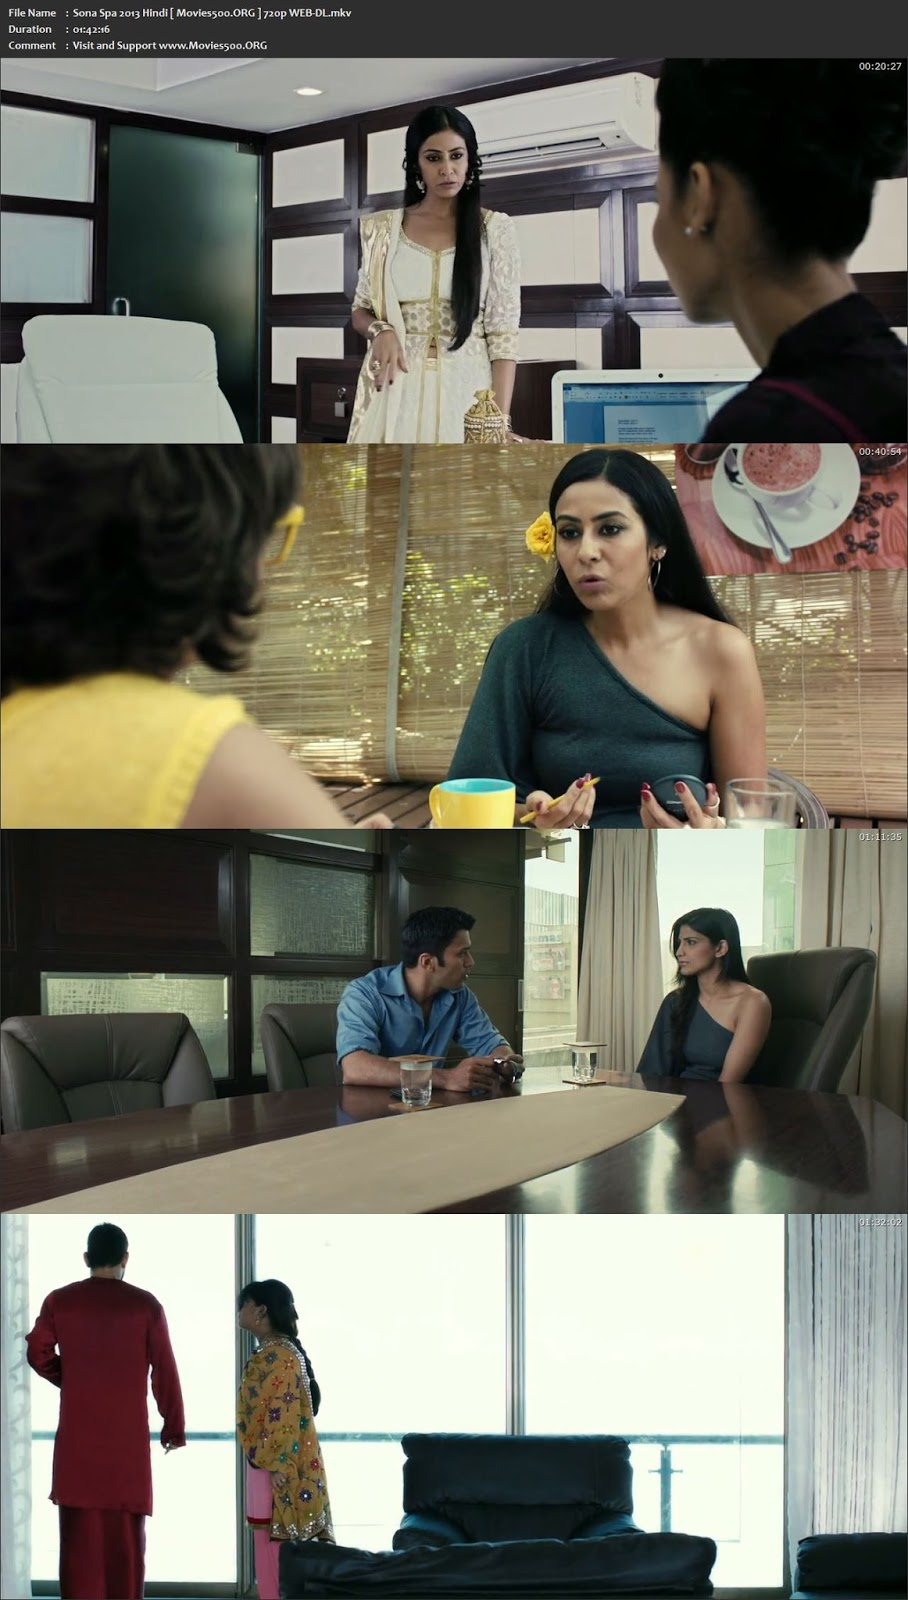 Sona Spa 2013 Hindi Full Movie WEB DL 720p ESubs